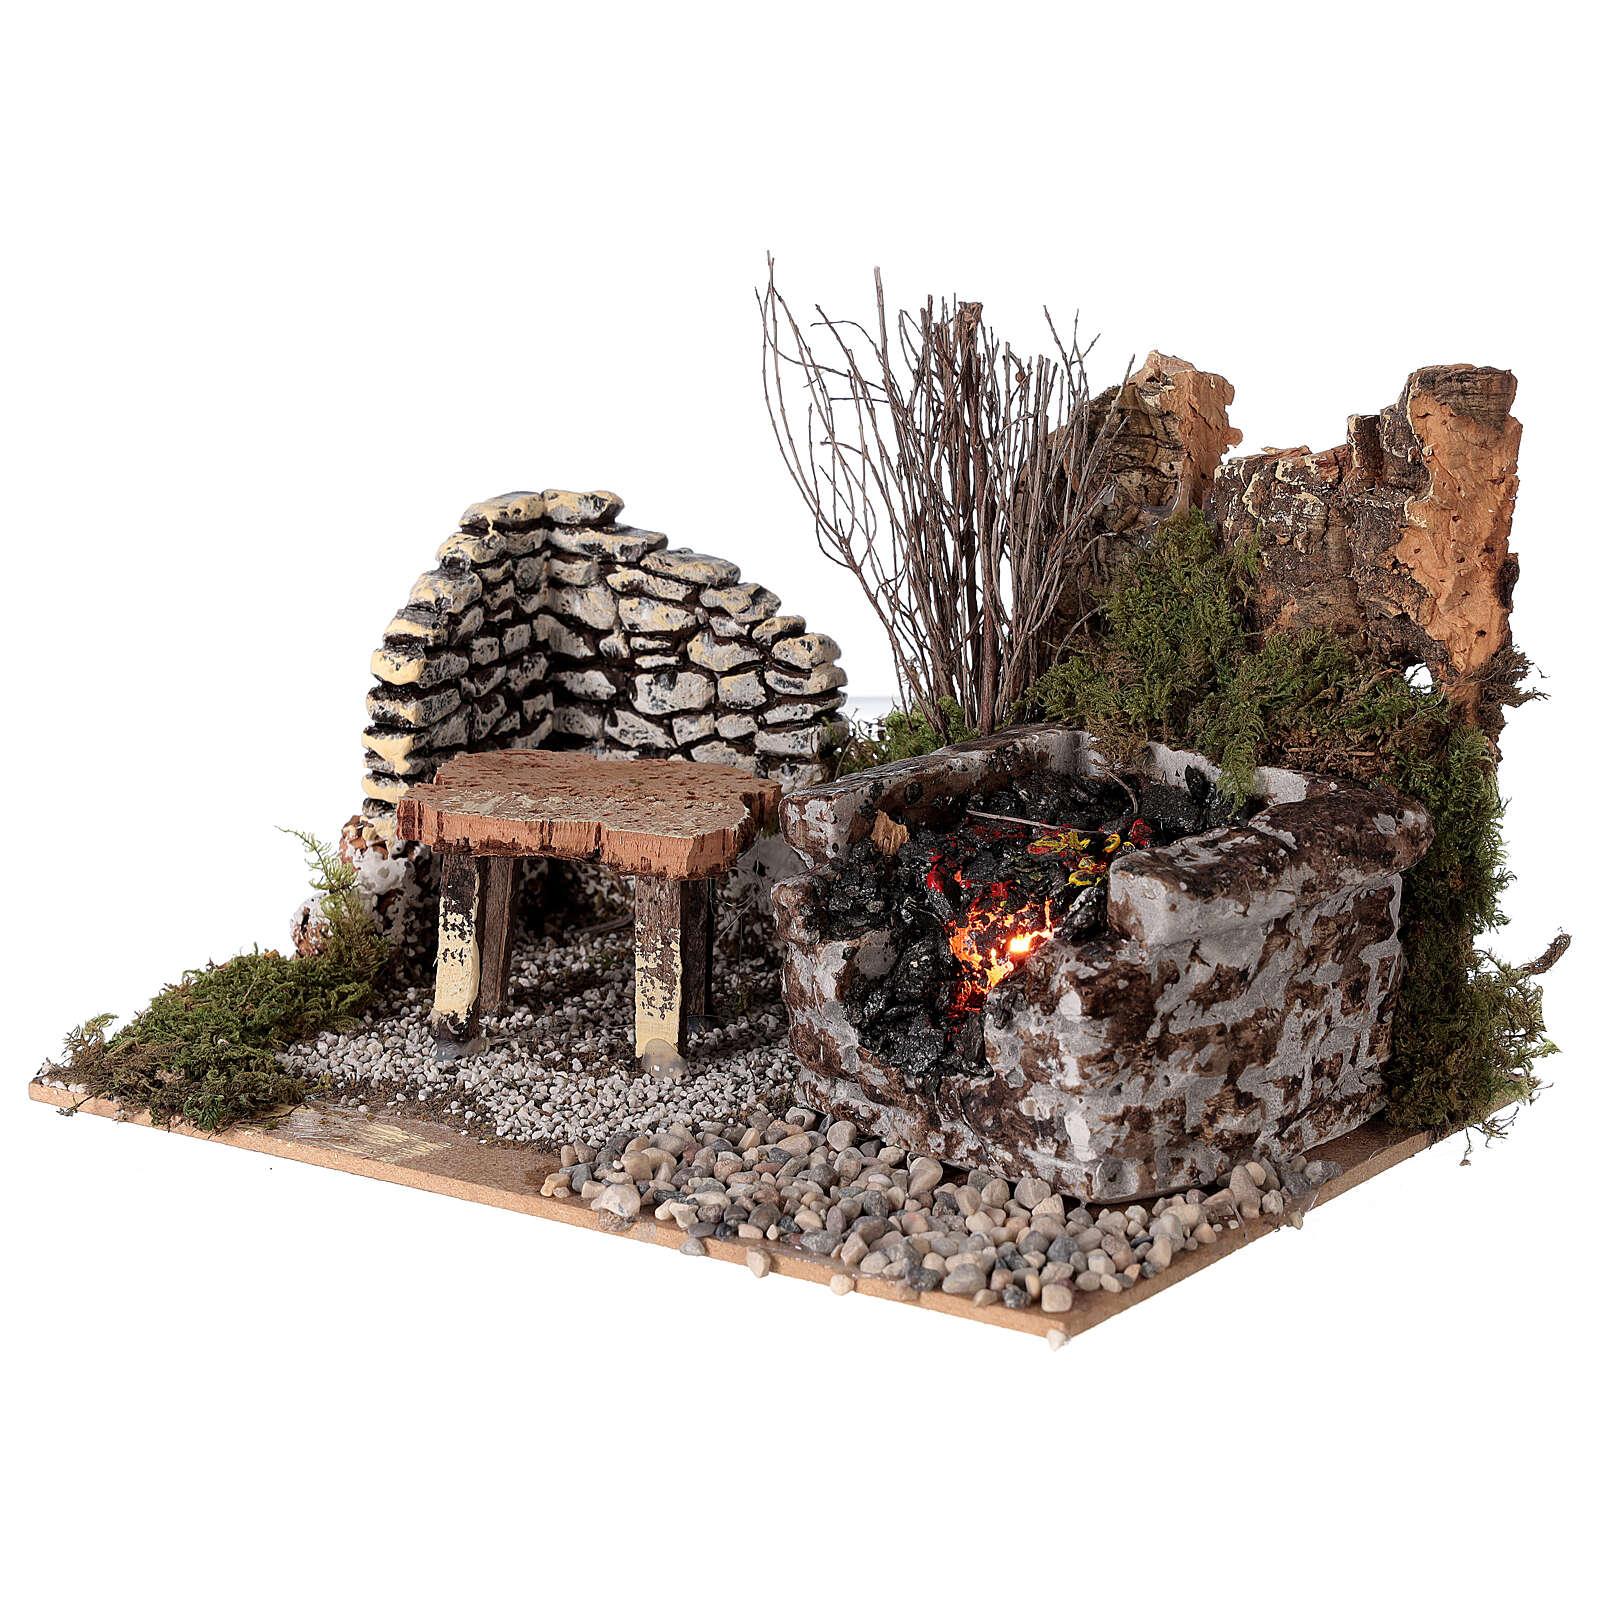 Electric fire effect 10x20x15 cm for Nativity scene 4